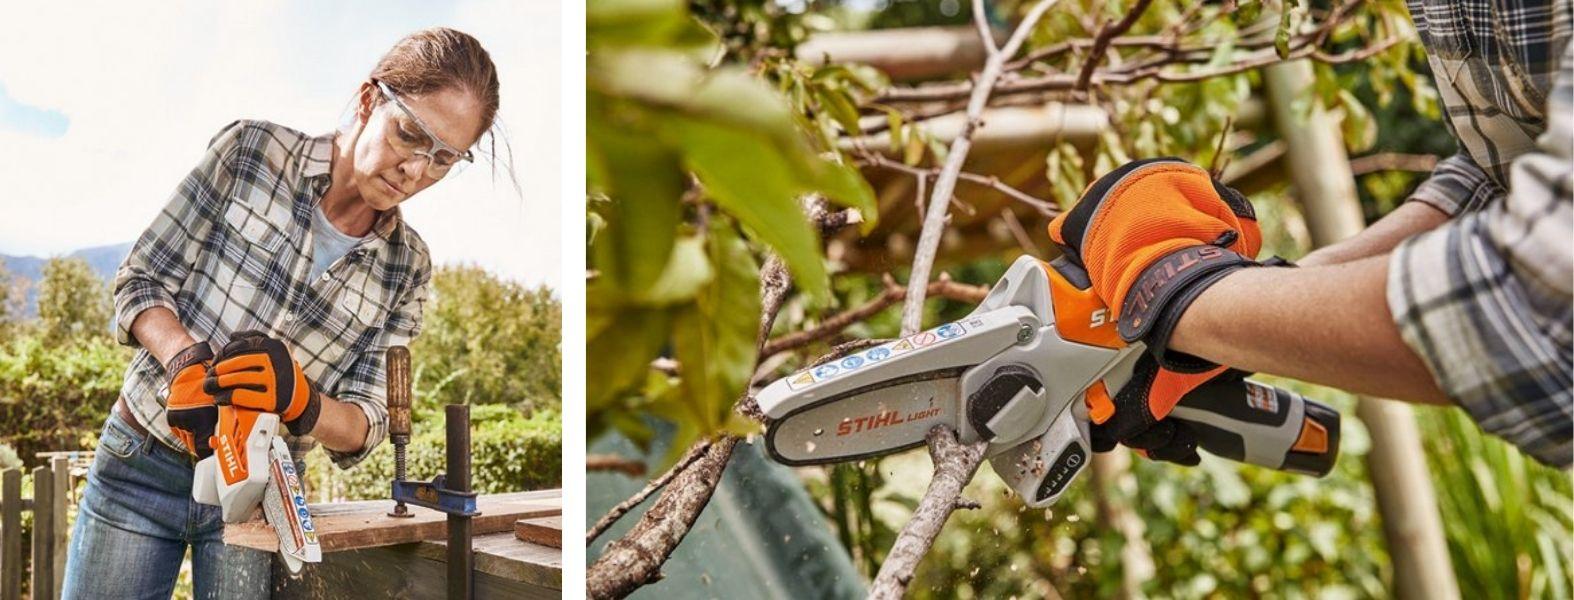 STIHL GTA 26 Handheld tree pruner